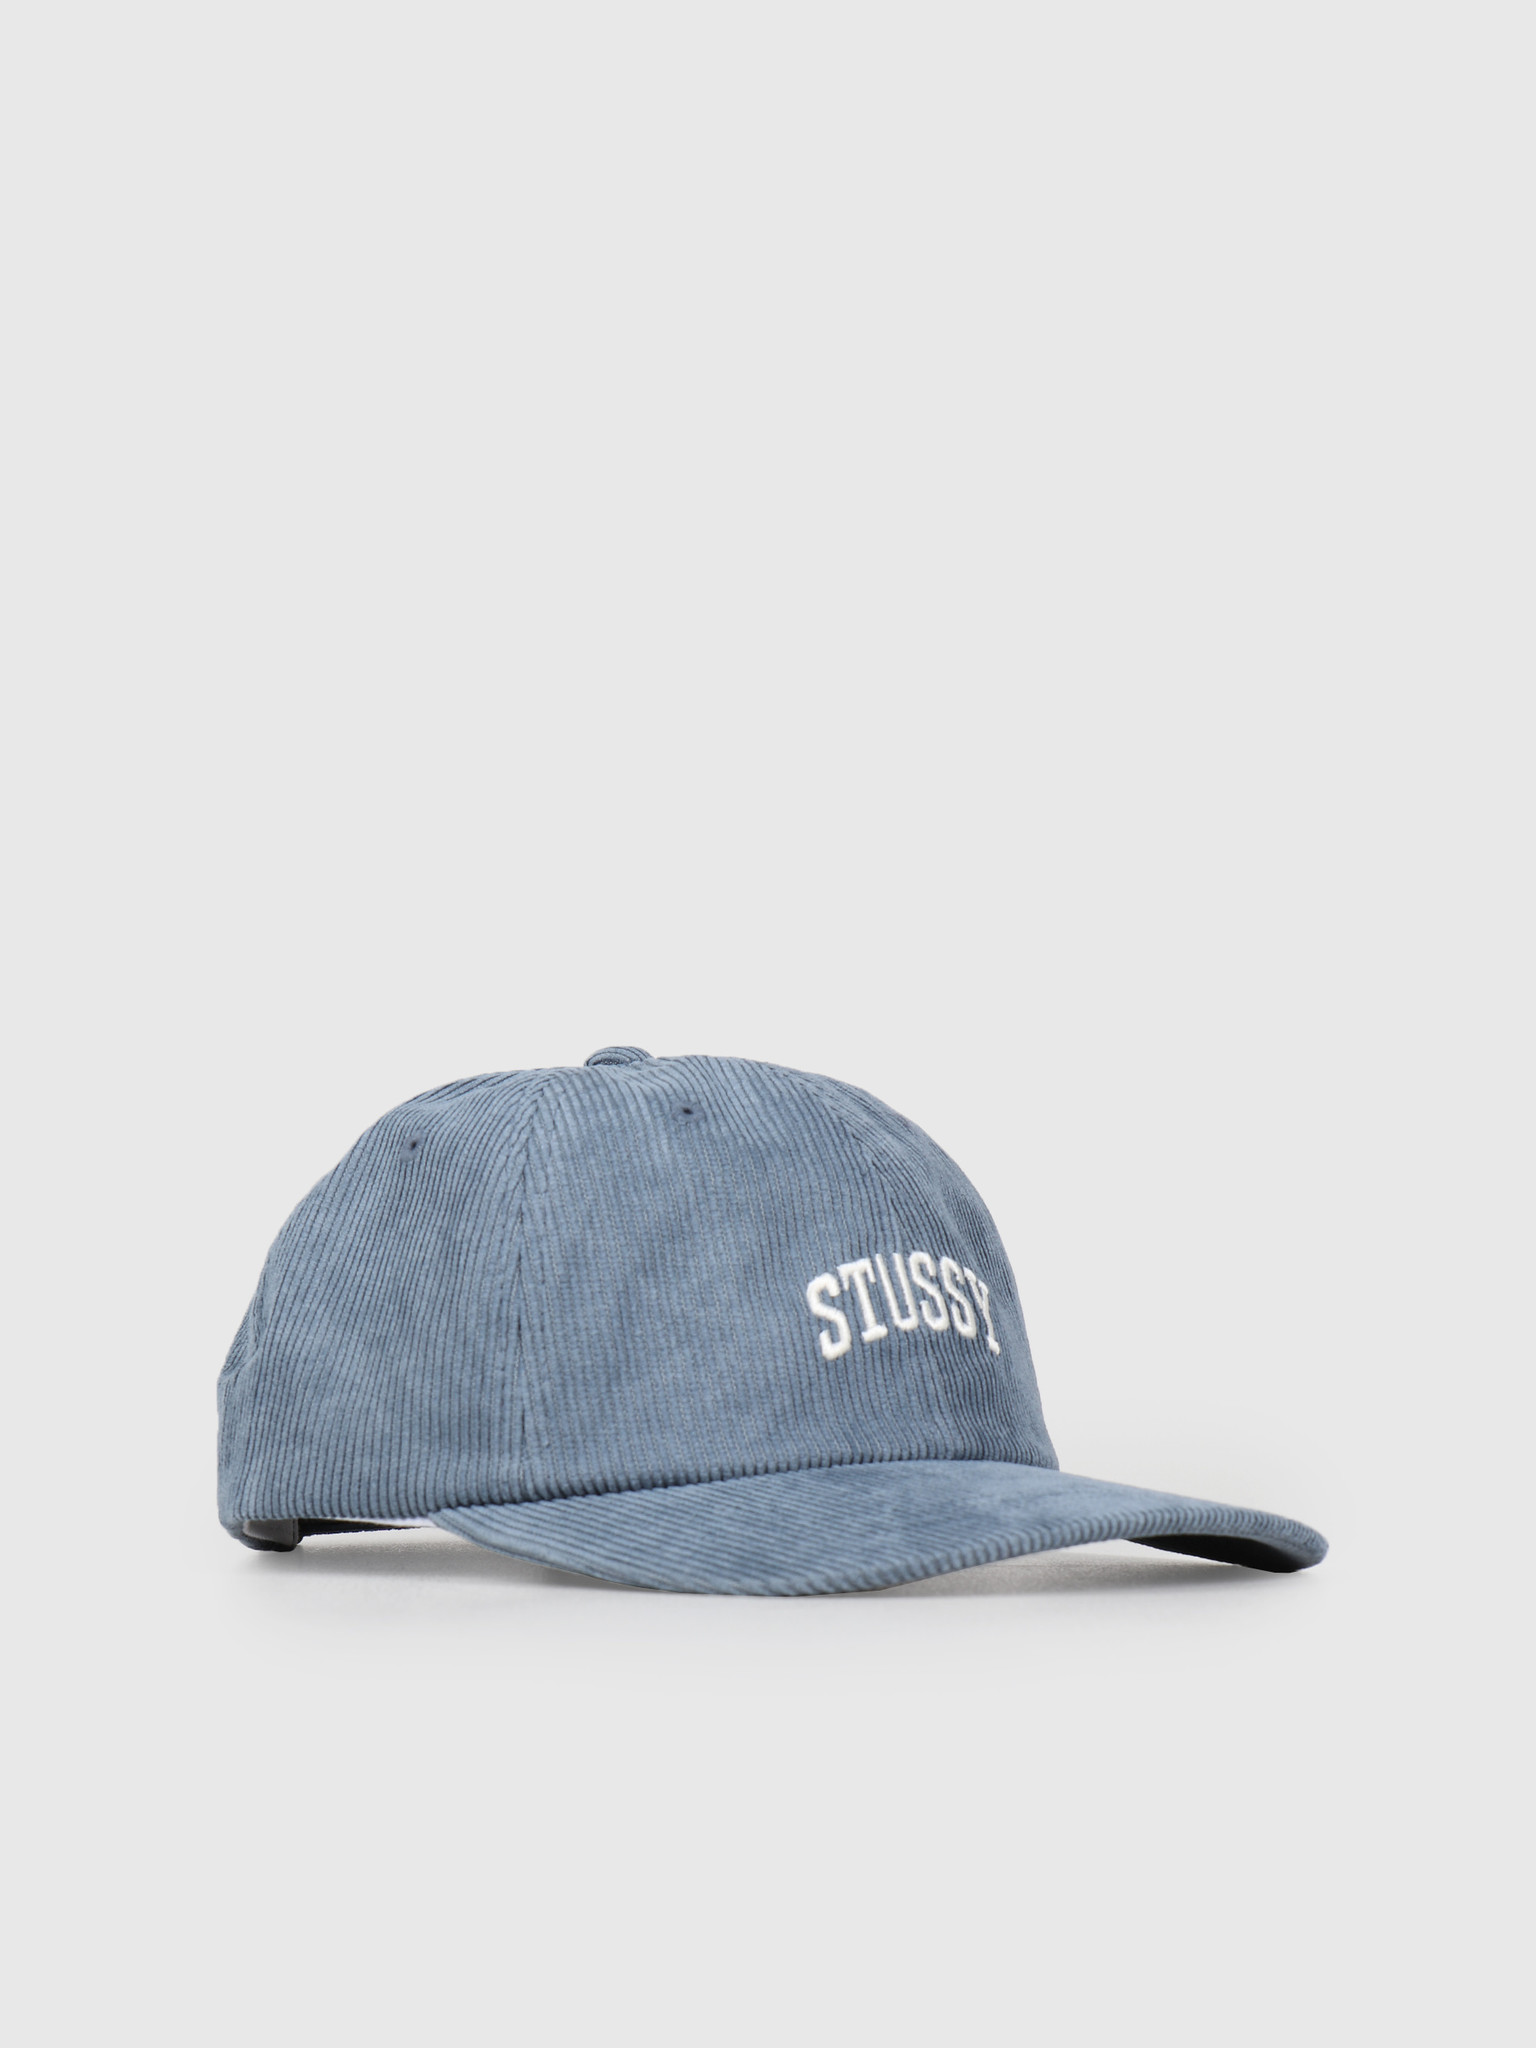 2942e6ef2b6 Stussy Stussy Cord Low Pro Cap Blue 0801